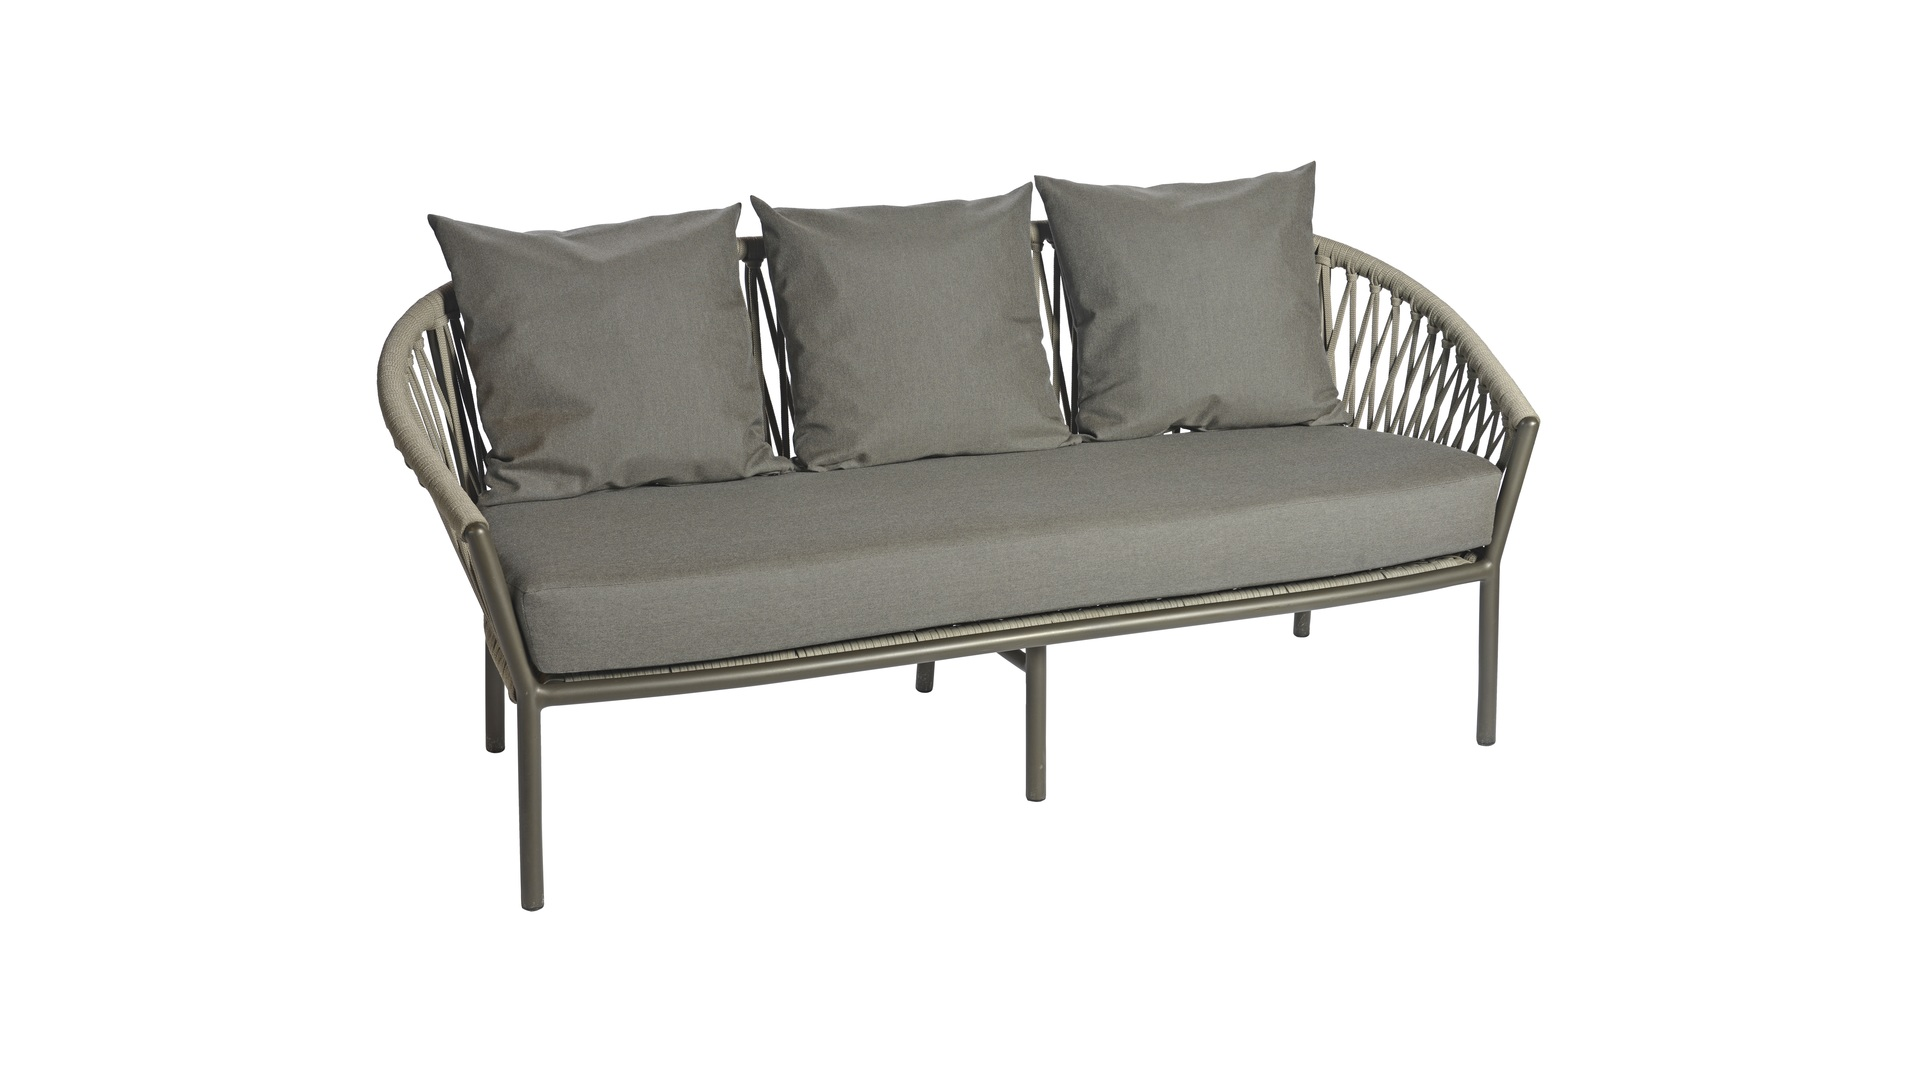 2020 Borek Ardenza belt Majinto sofa slate 4313-06 2.jpg